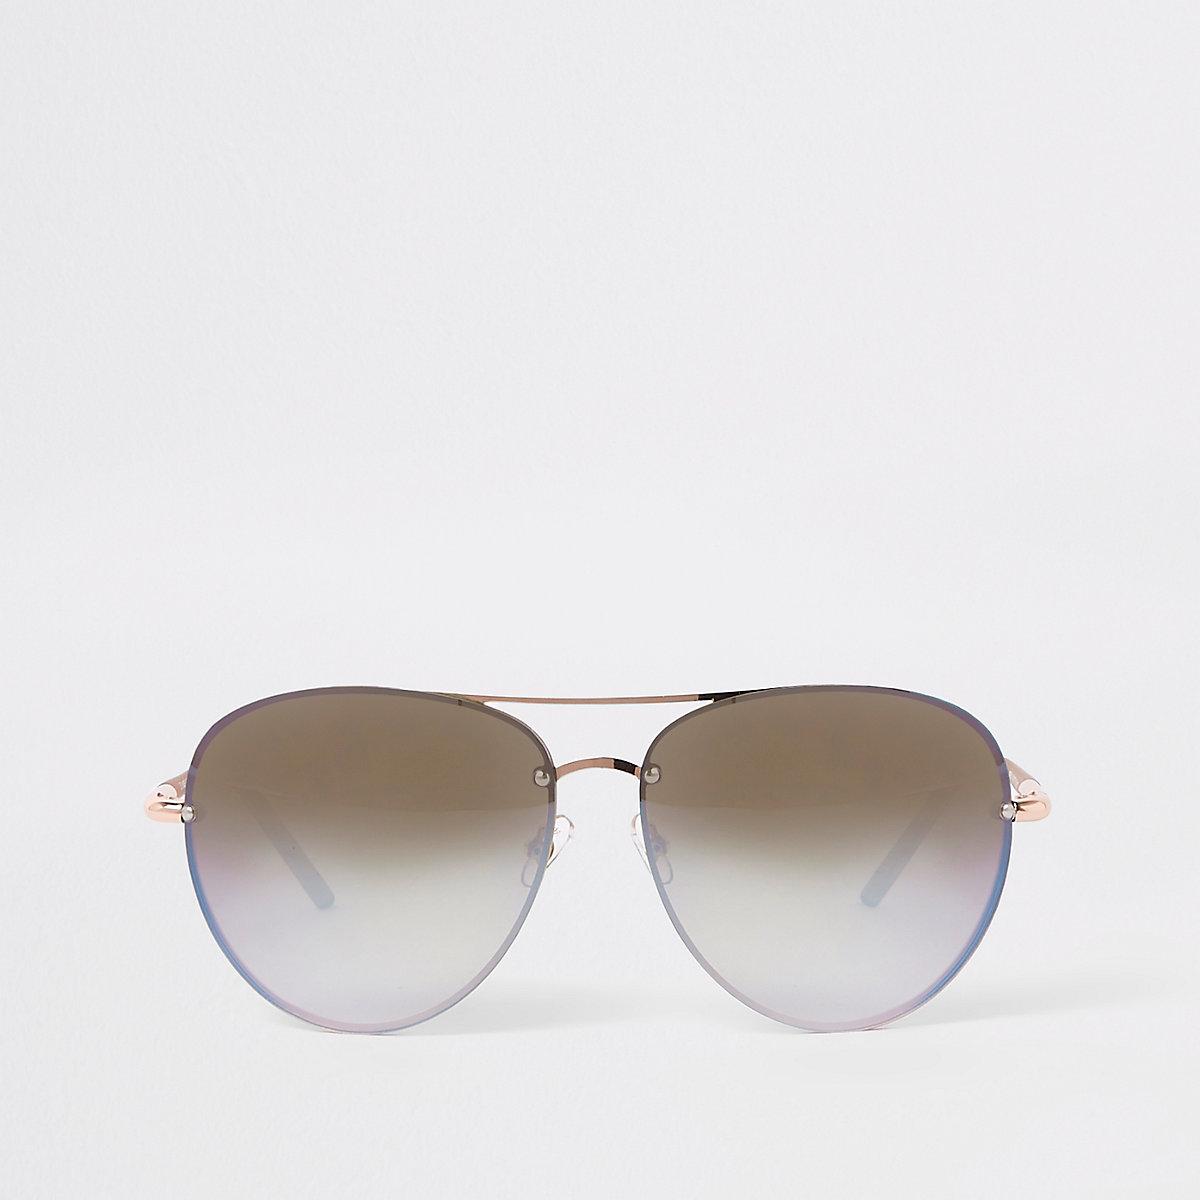 Rose gold tone mirror blue lens sunglasses